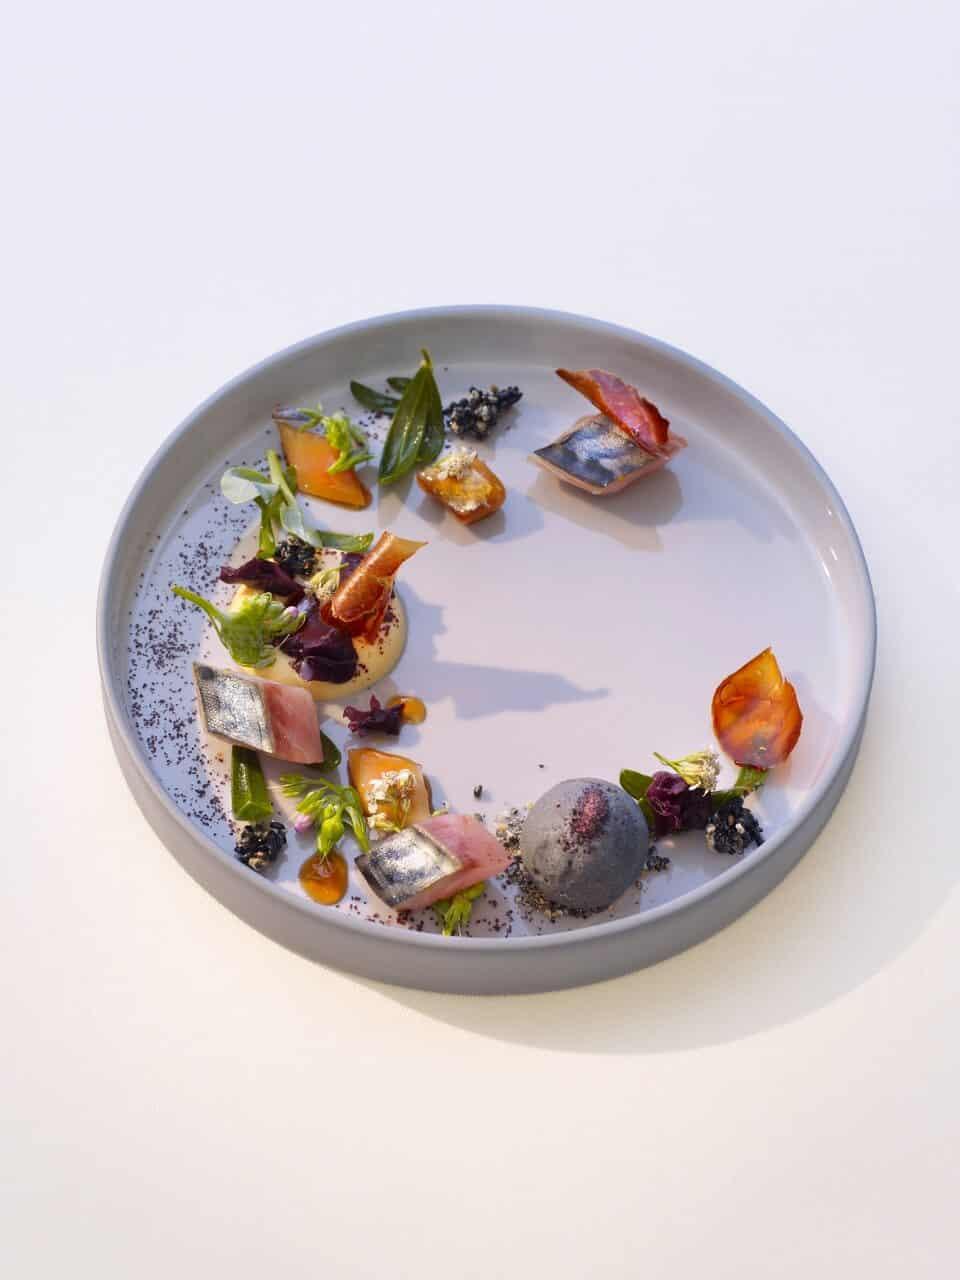 Marinated Mackerel With Sesame Ice Cream And Passion Fruit